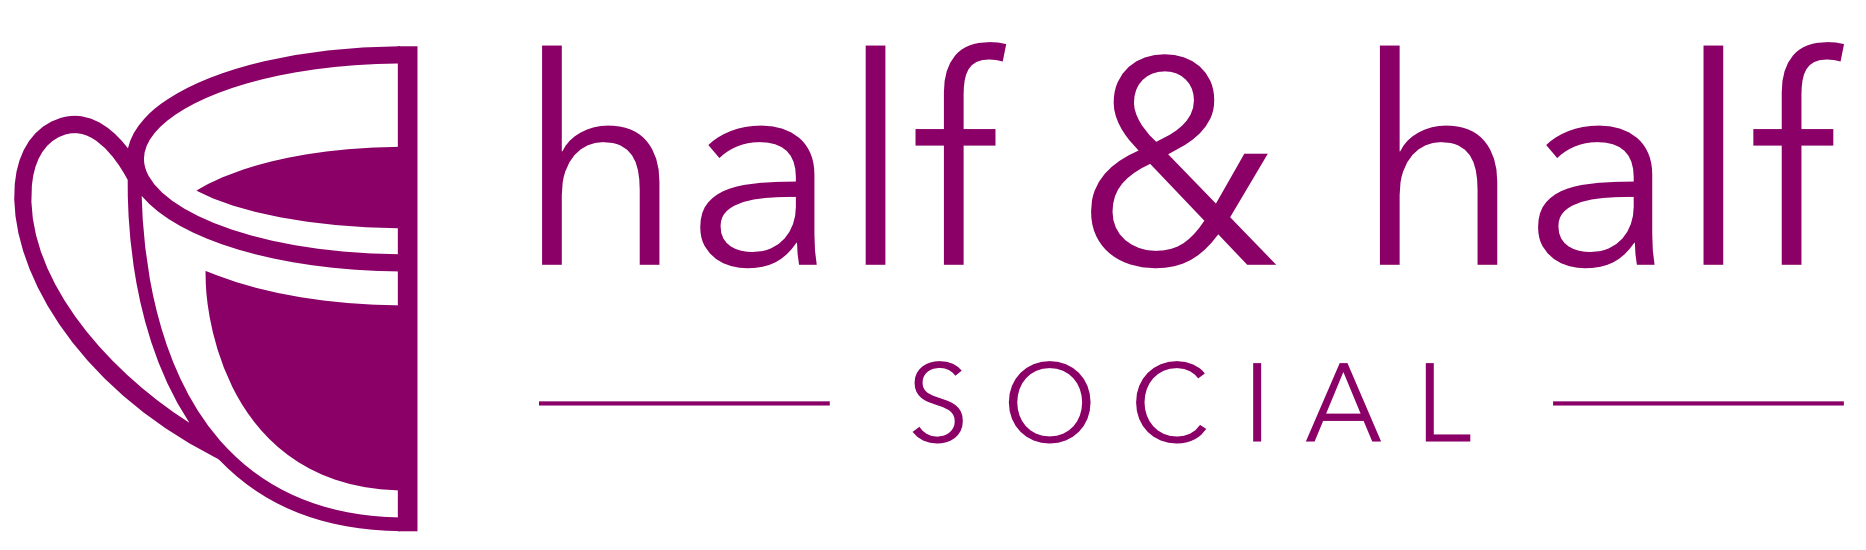 Half & Half Social